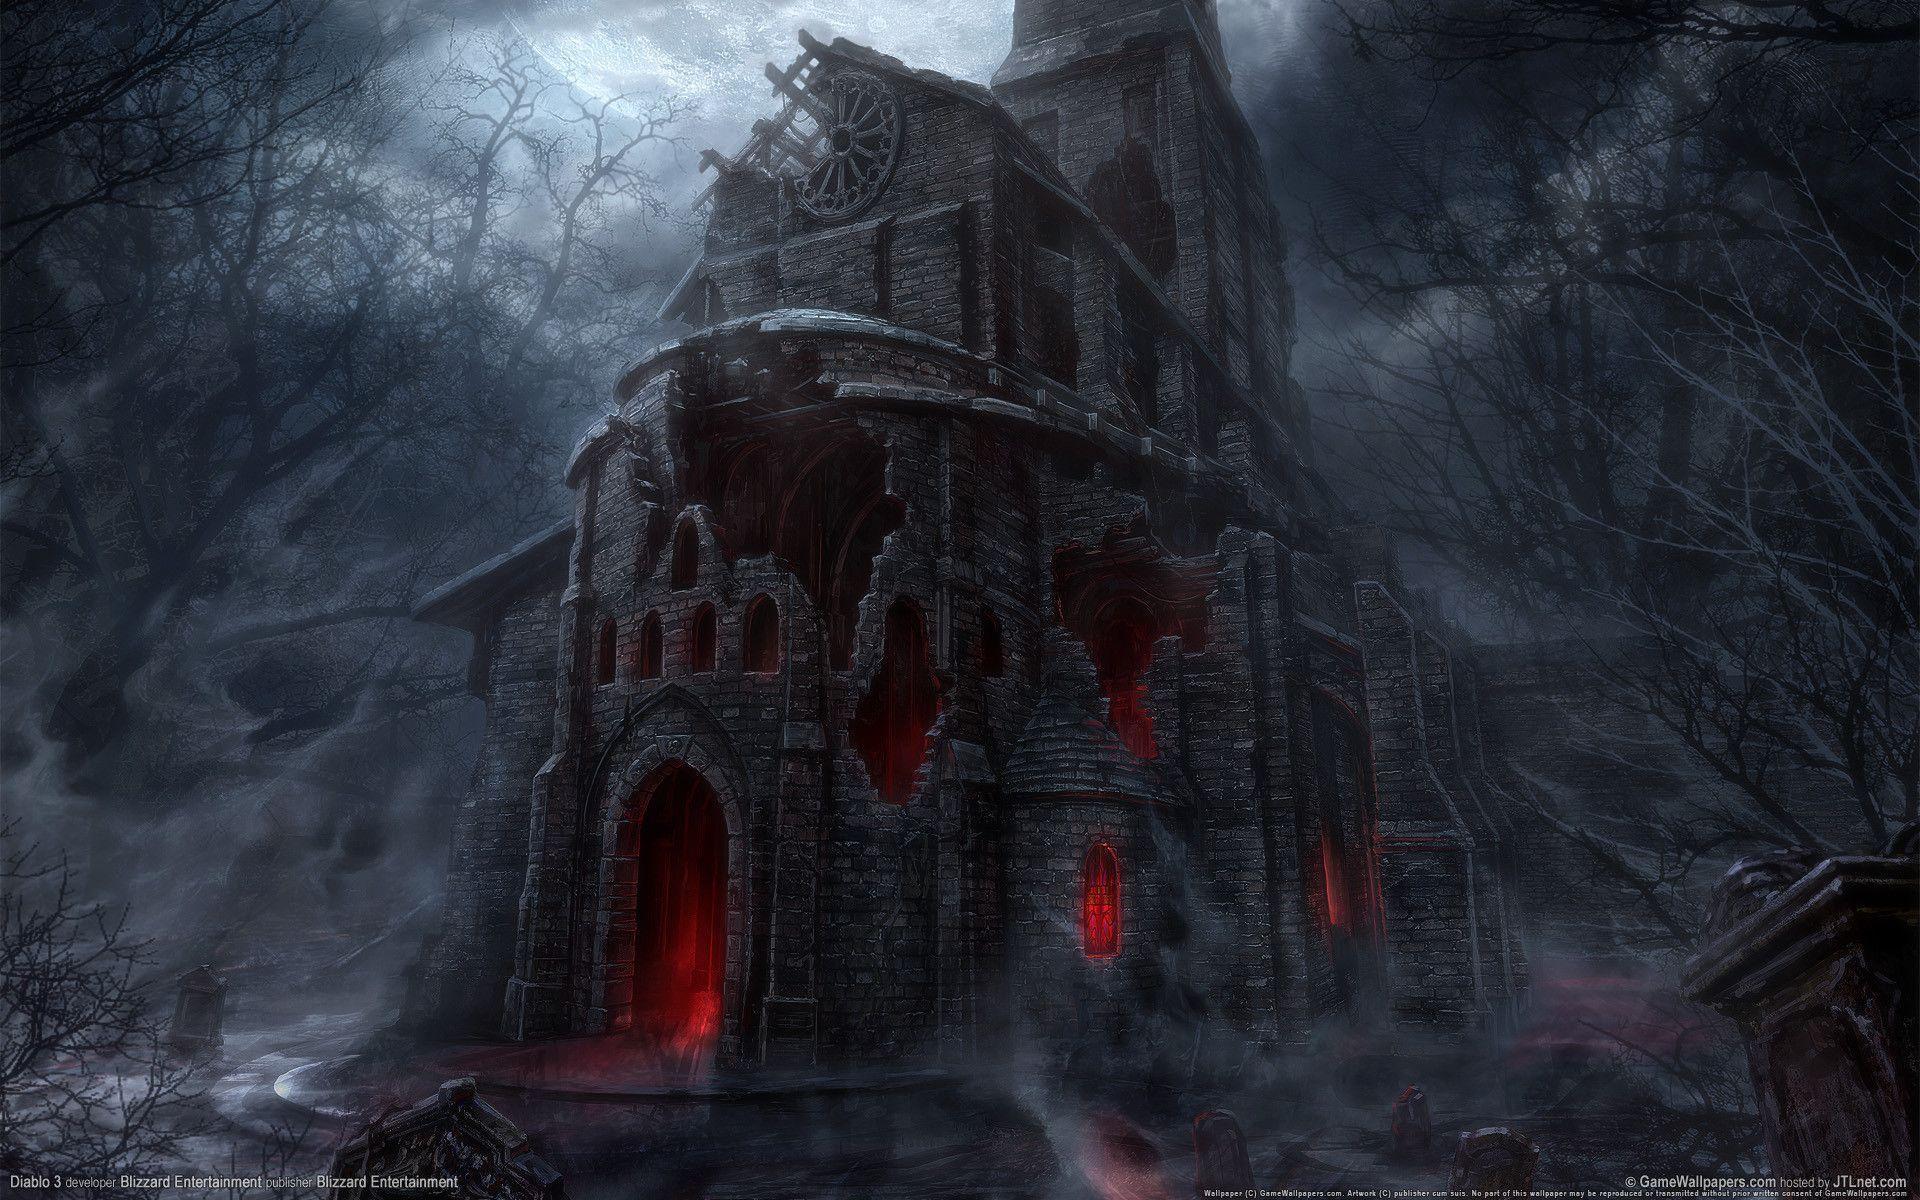 Diablo 3 Wallpapers - Full HD wallpaper search - page 14